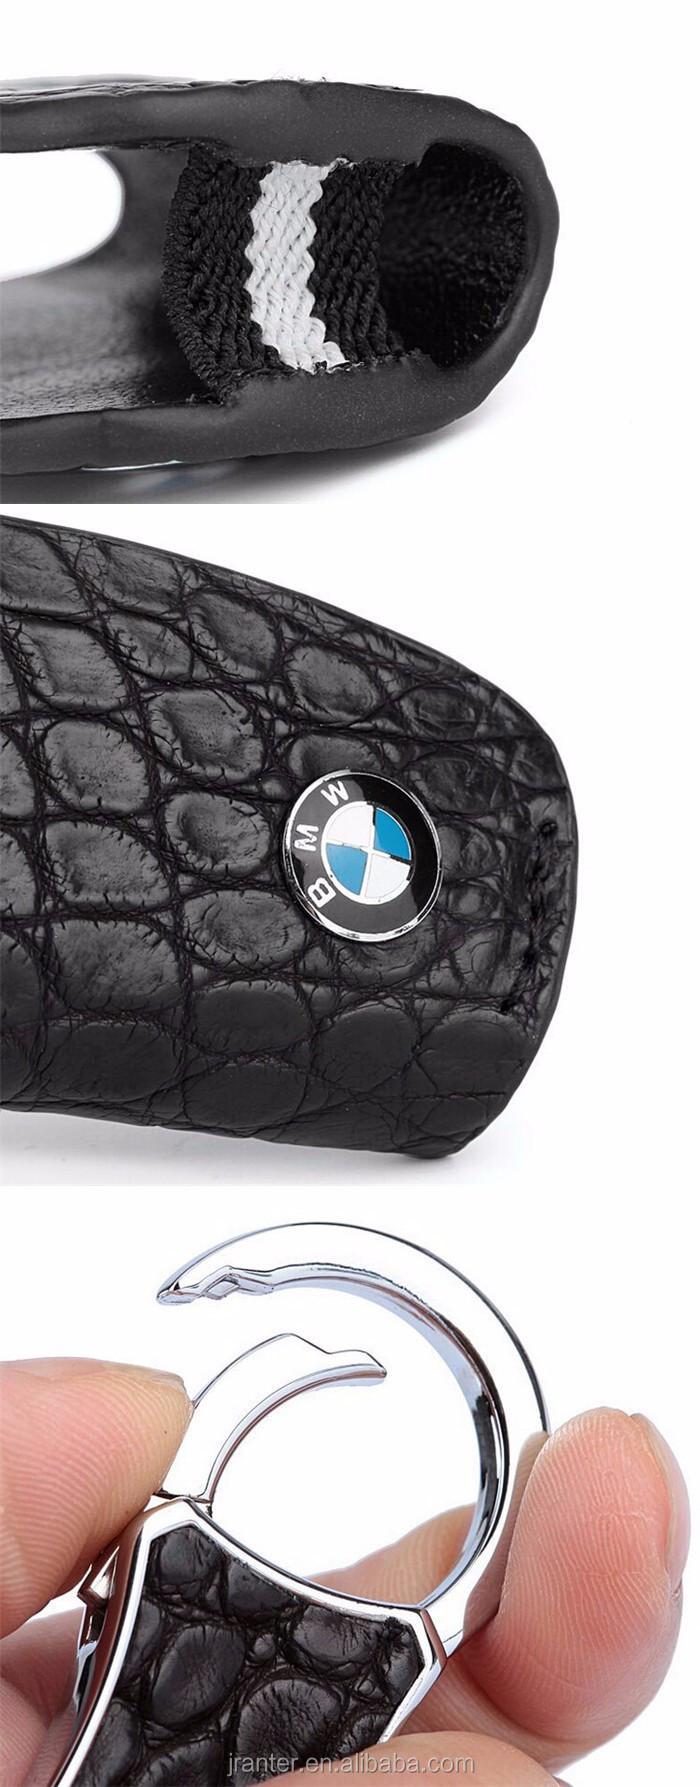 High-end customized genuine crocodile leather car key holder leather car key pouch with zipper_10